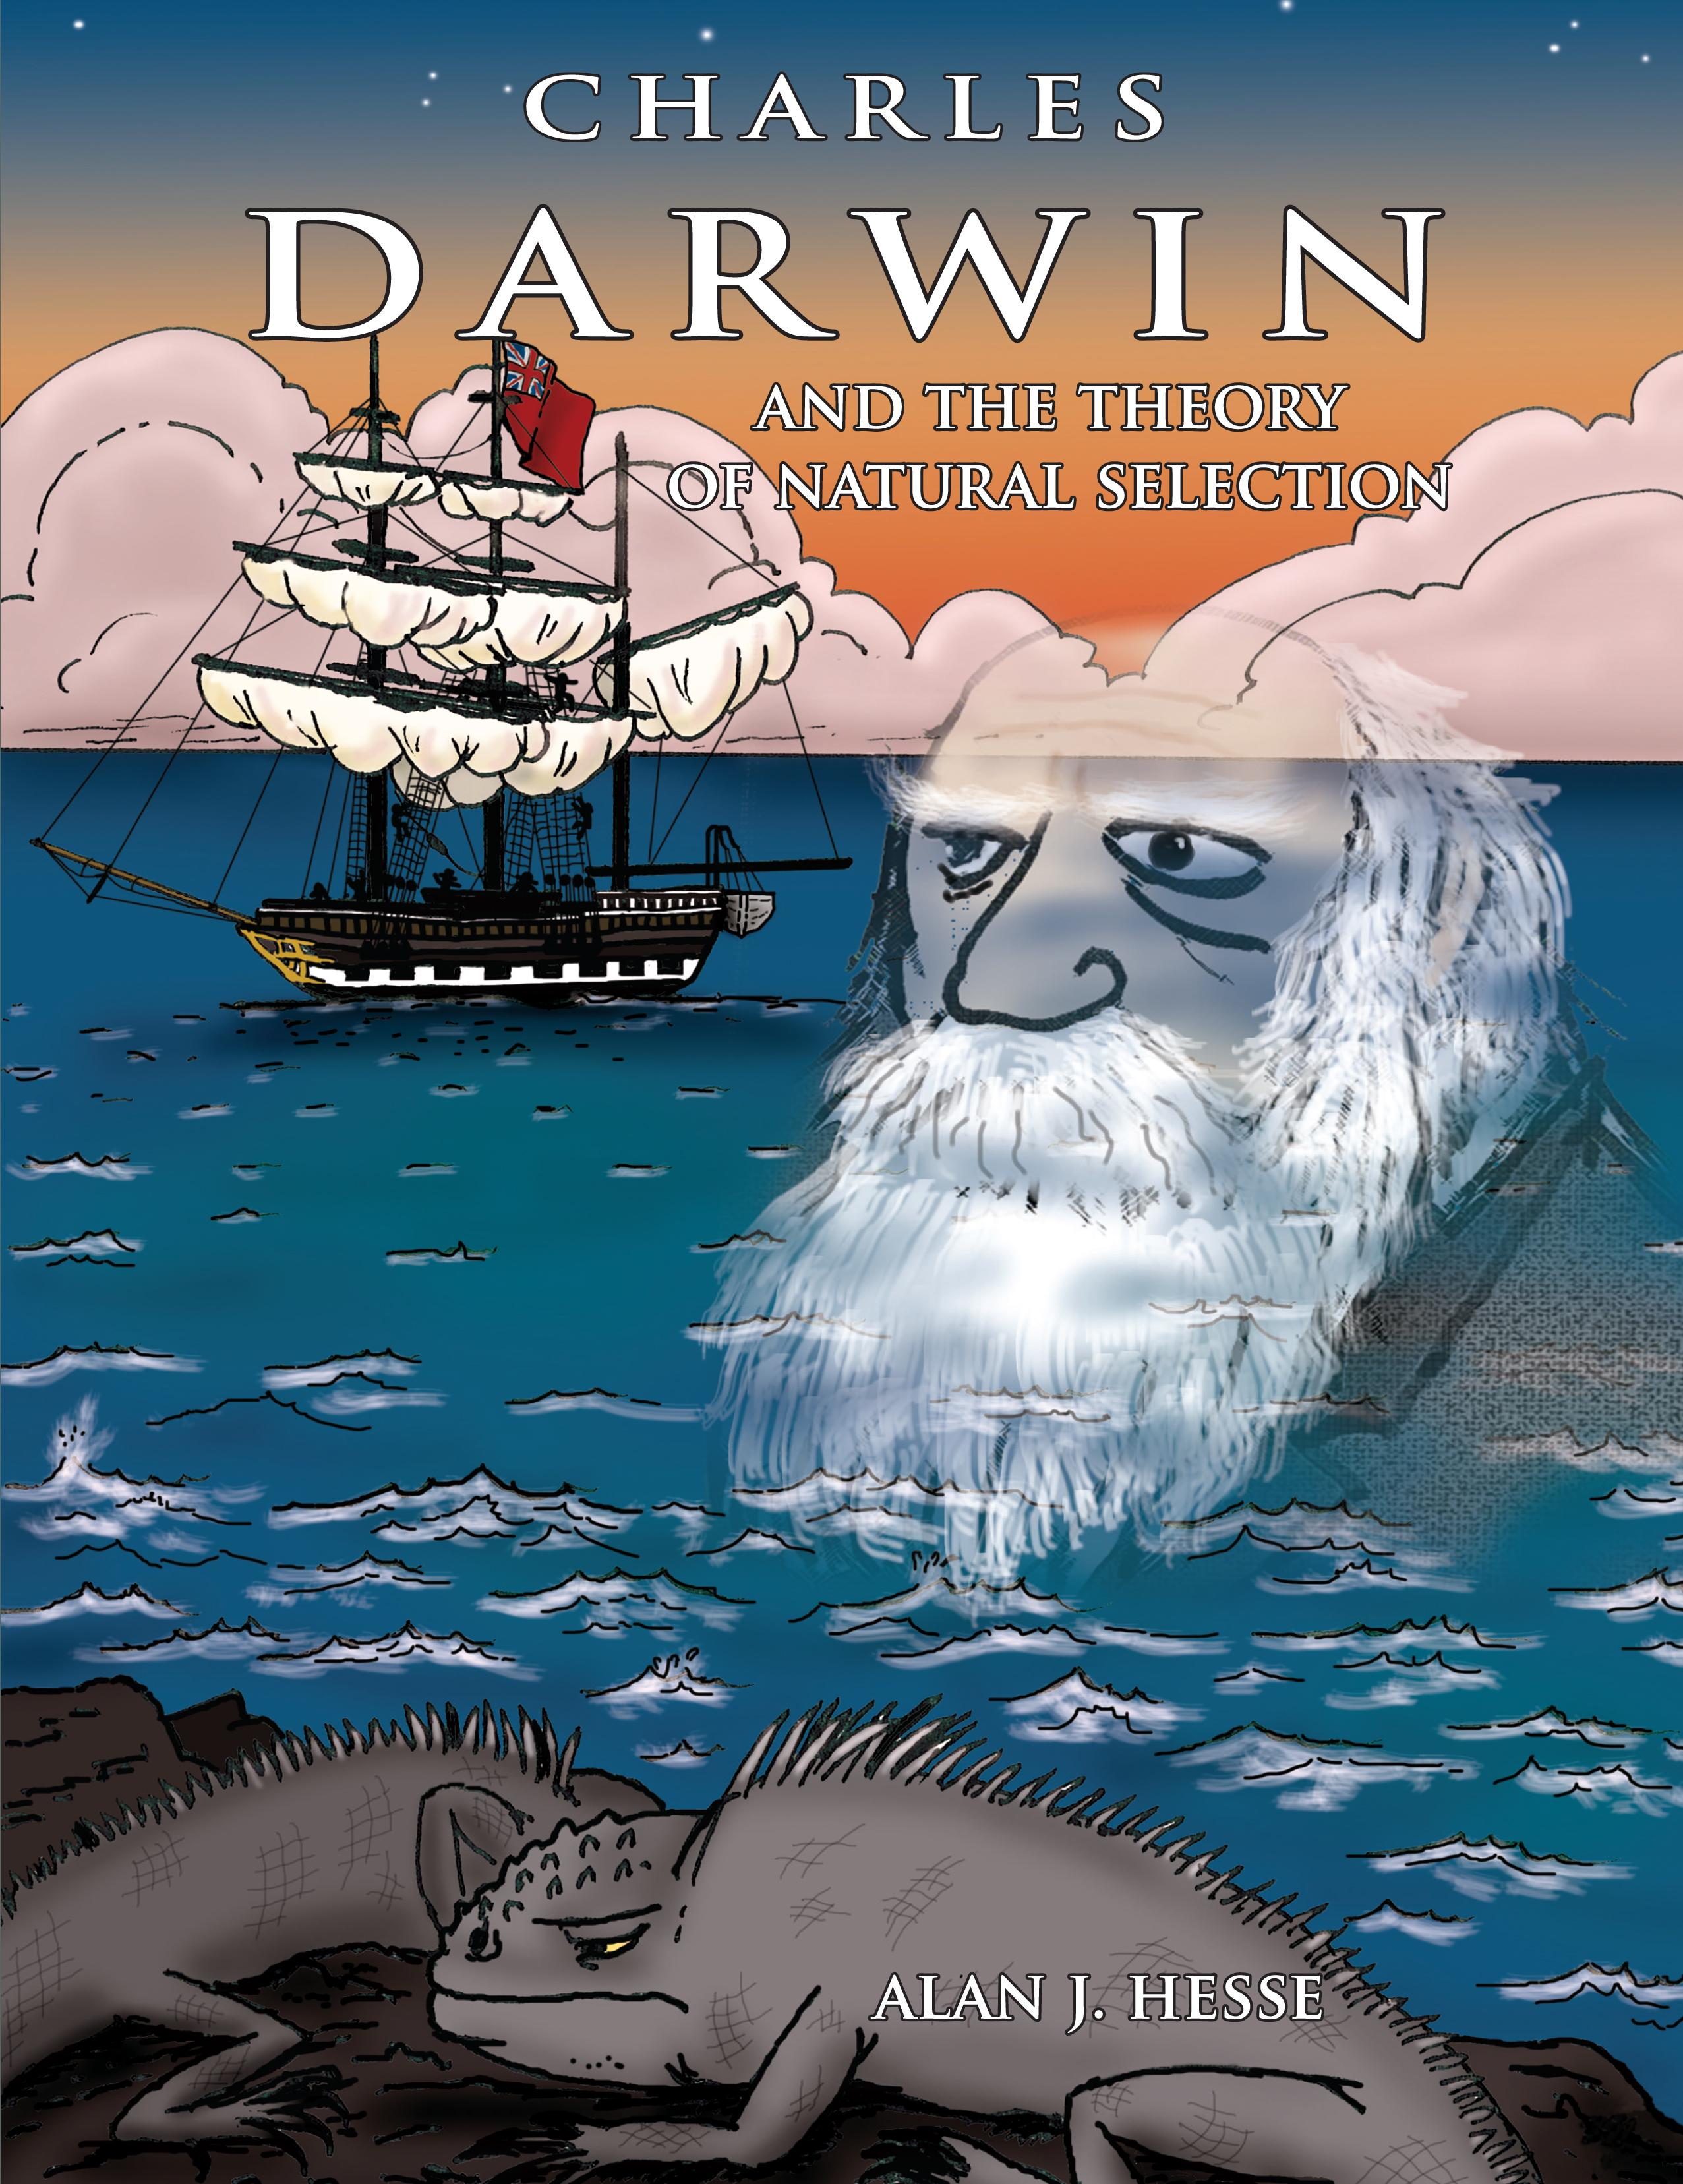 Charles Darwin & The Theory of Evolution